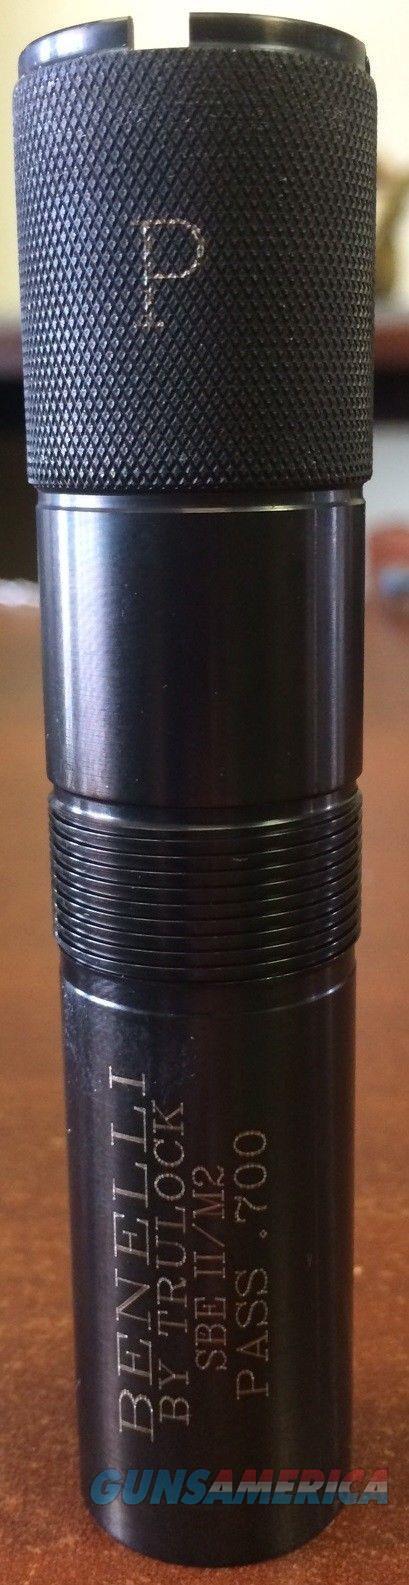 Benelli 12 Gauge Pass Shooting Imp Mod Choke Tube  Non-Guns > Shotgun Sports > Chokes